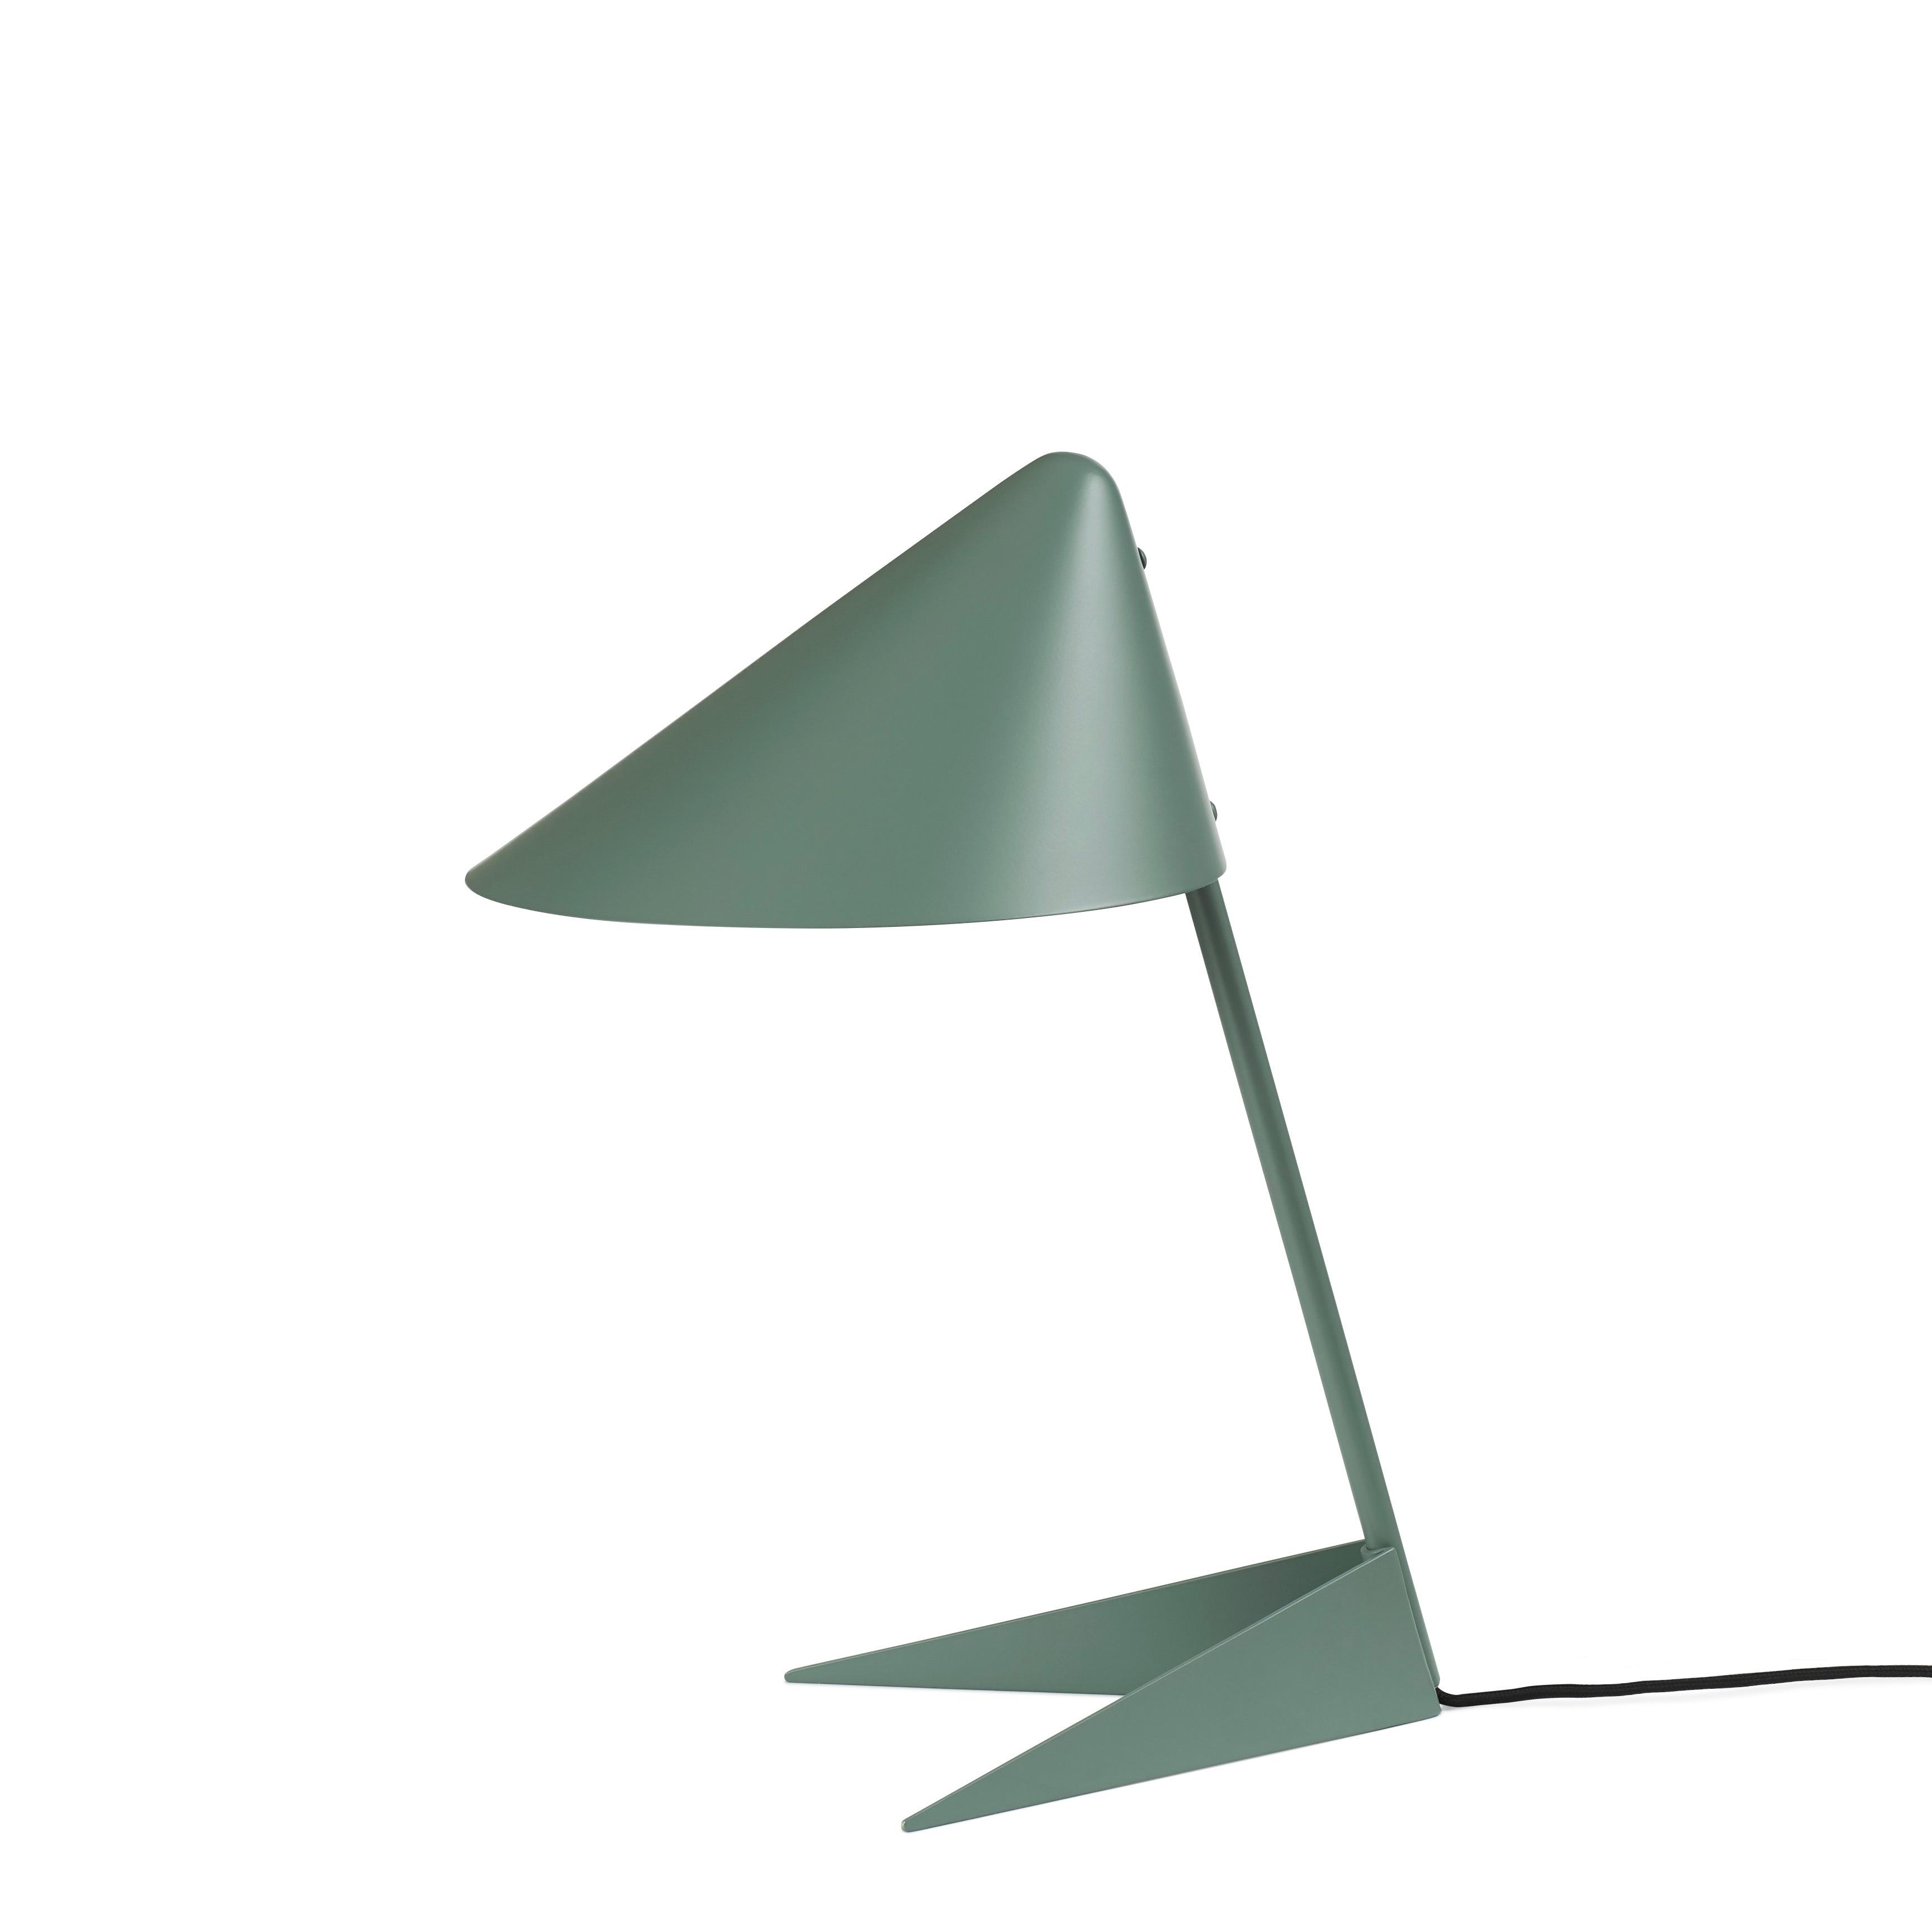 Ambience bordslampa dusty green